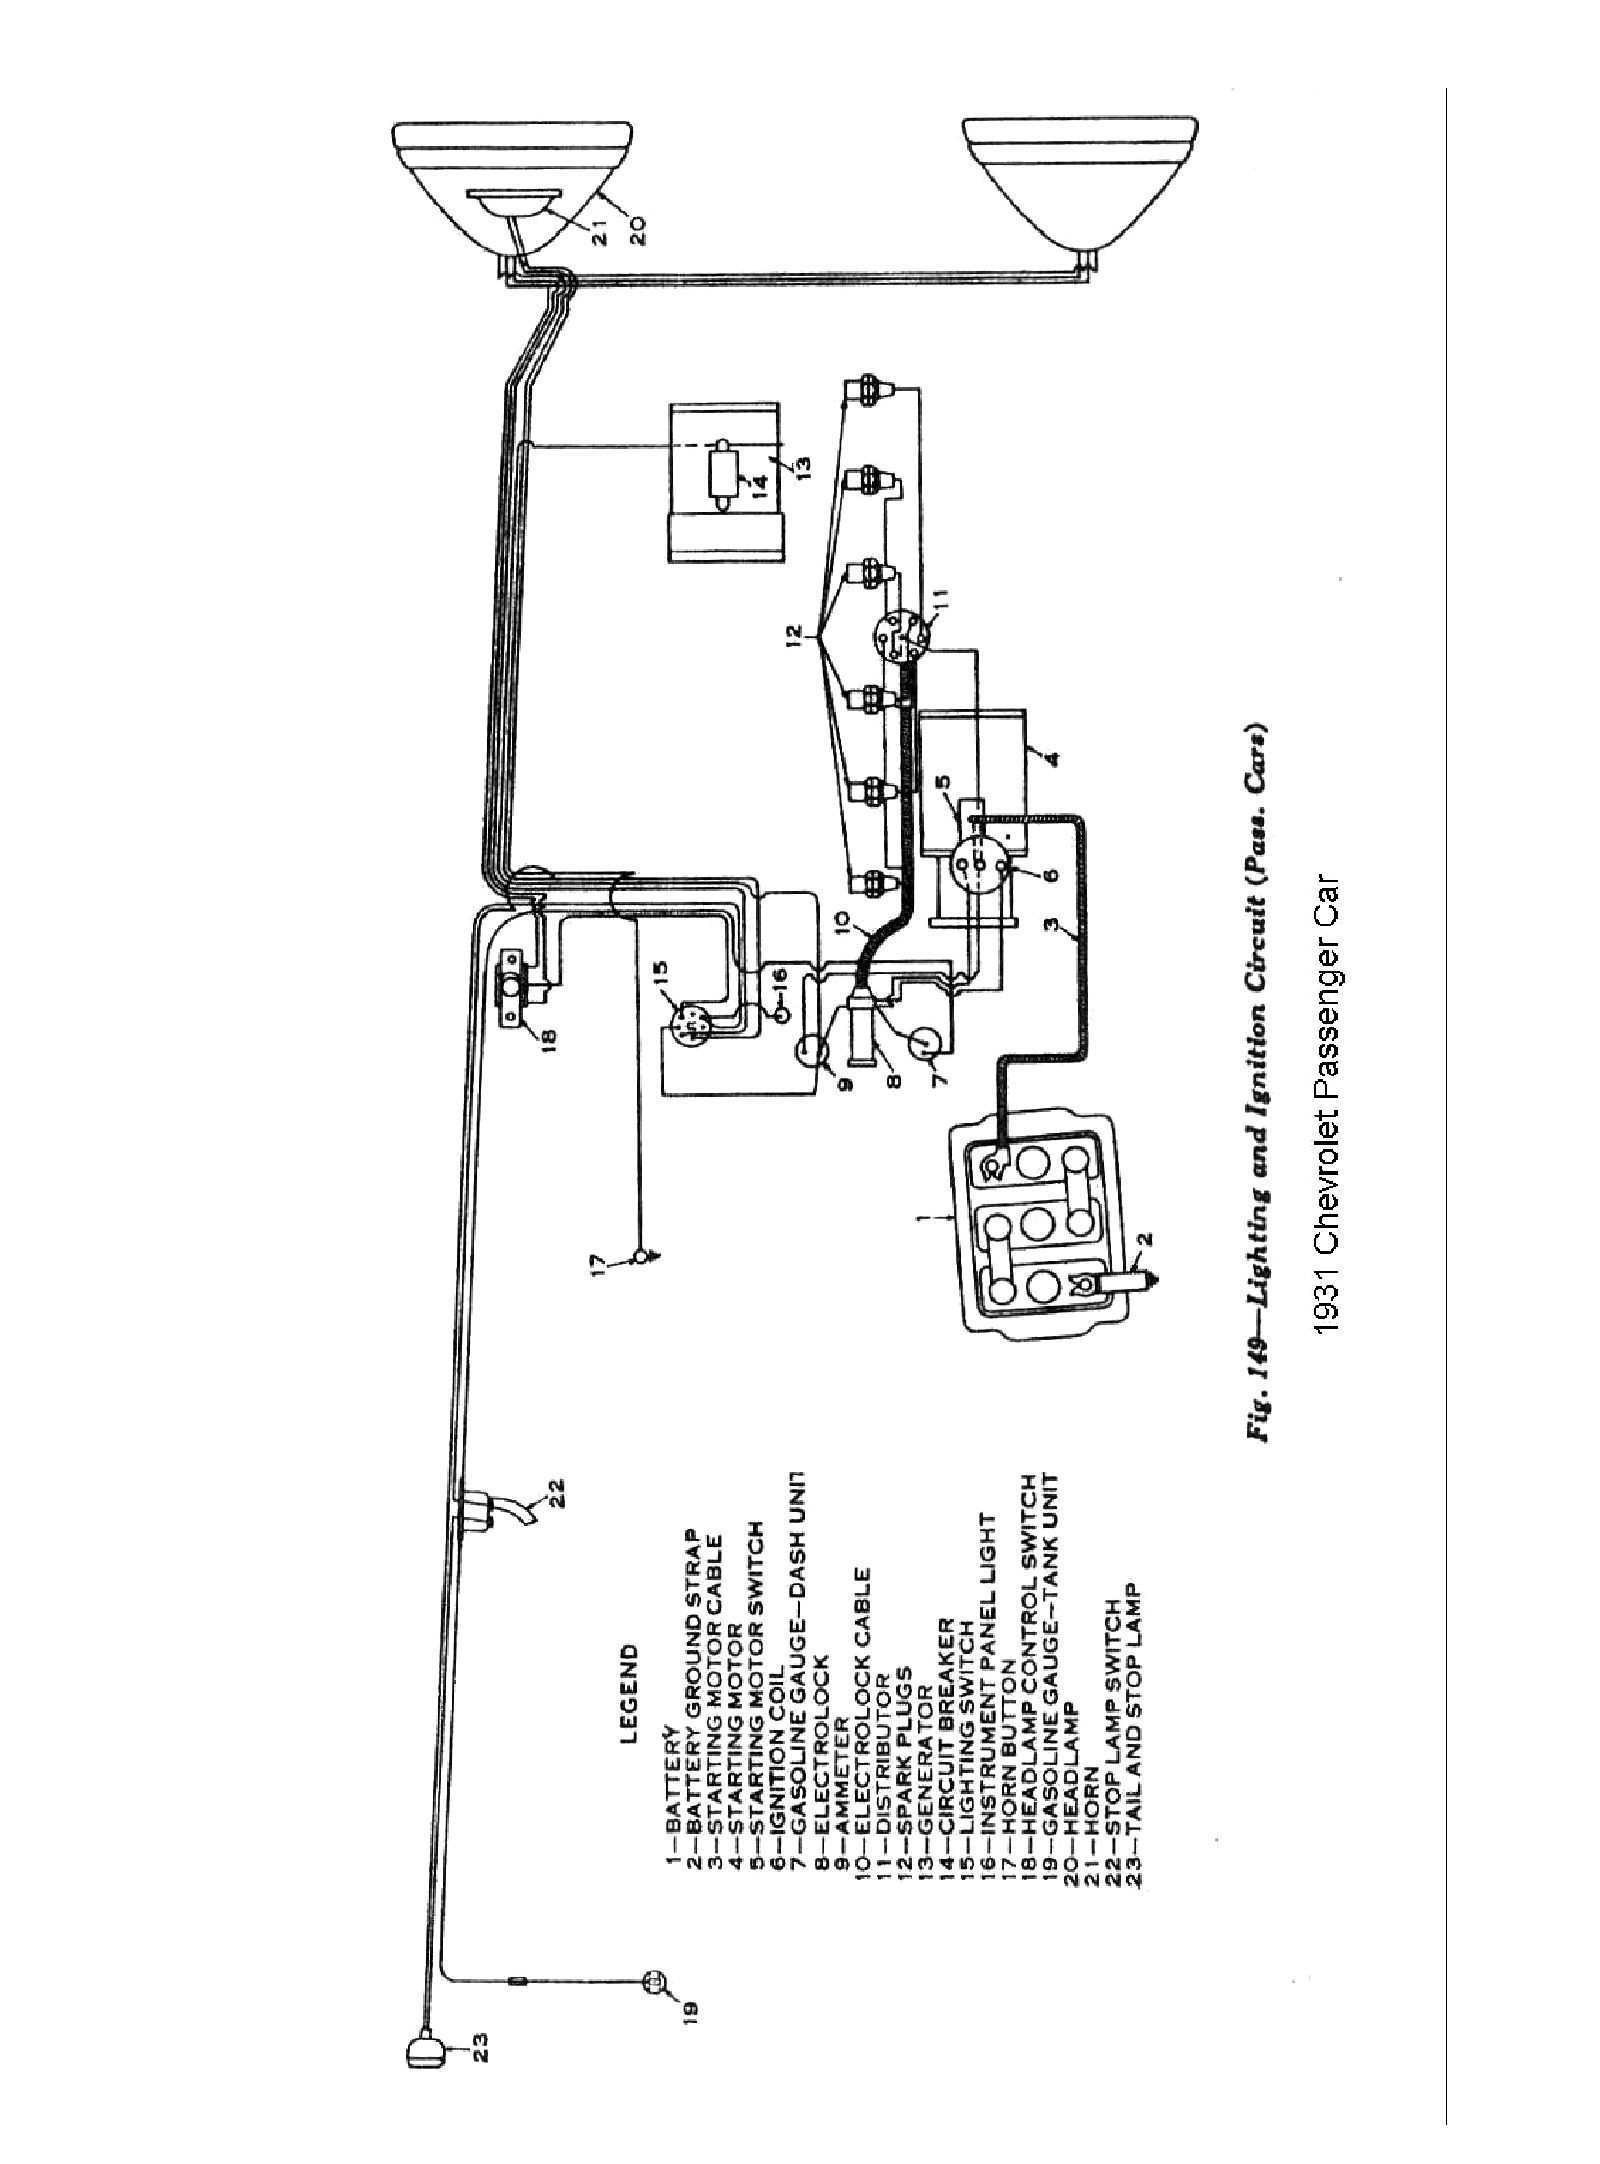 diagram of car lights download ford trucks wiring diagrams